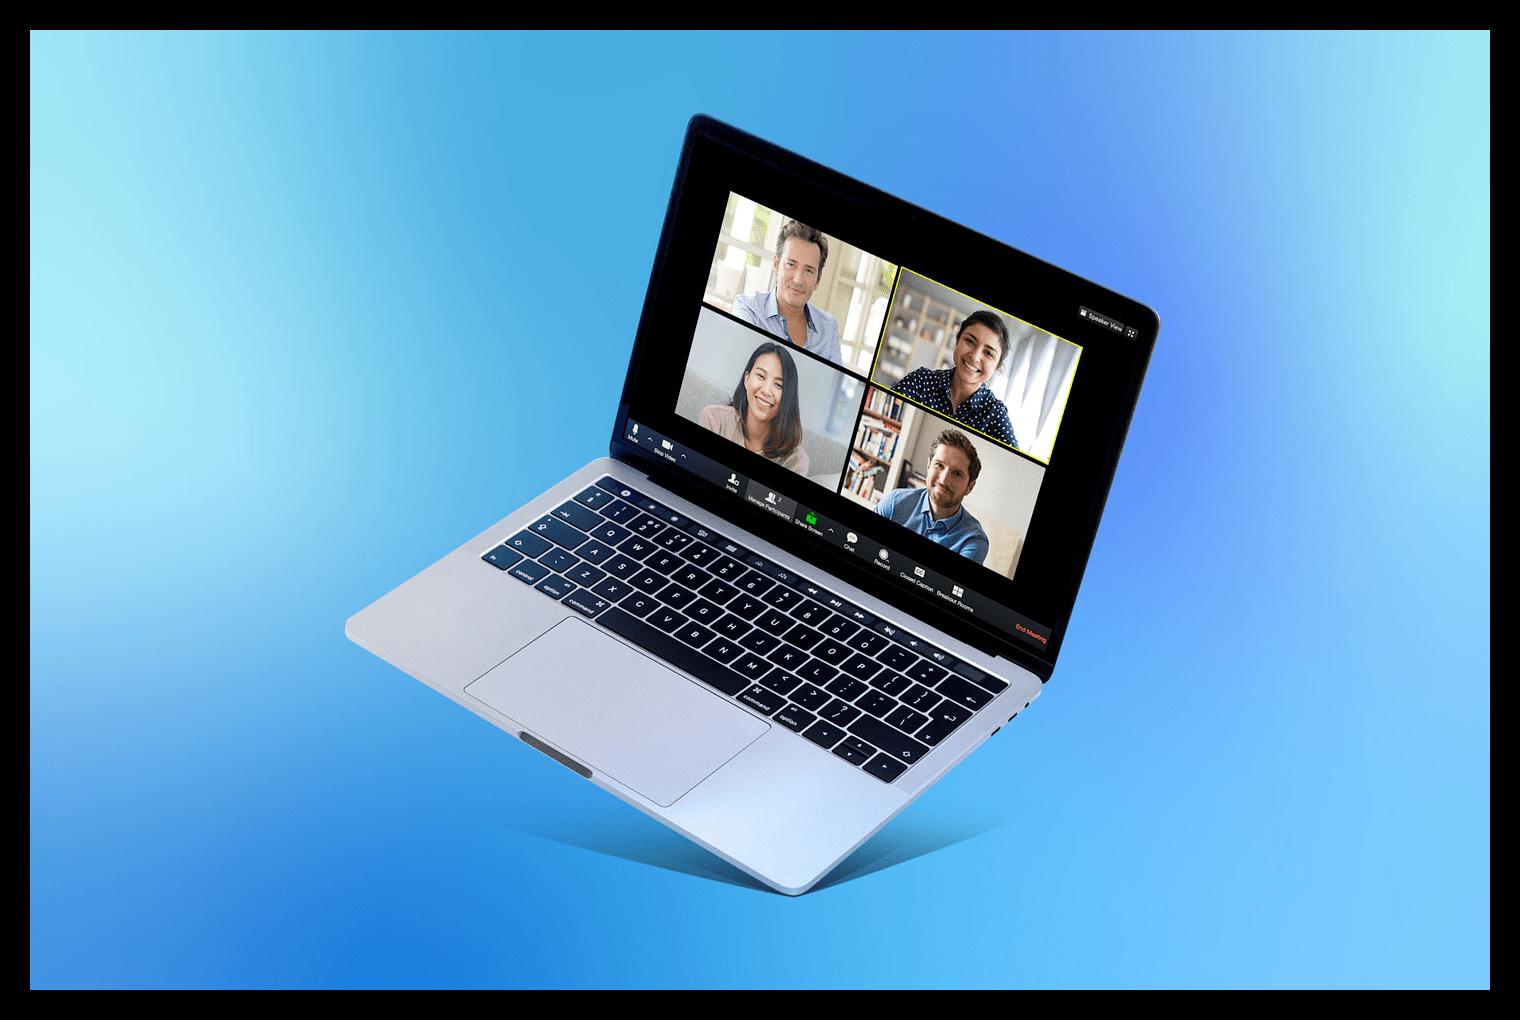 Картинка Ноутбук с запущенным Zoom